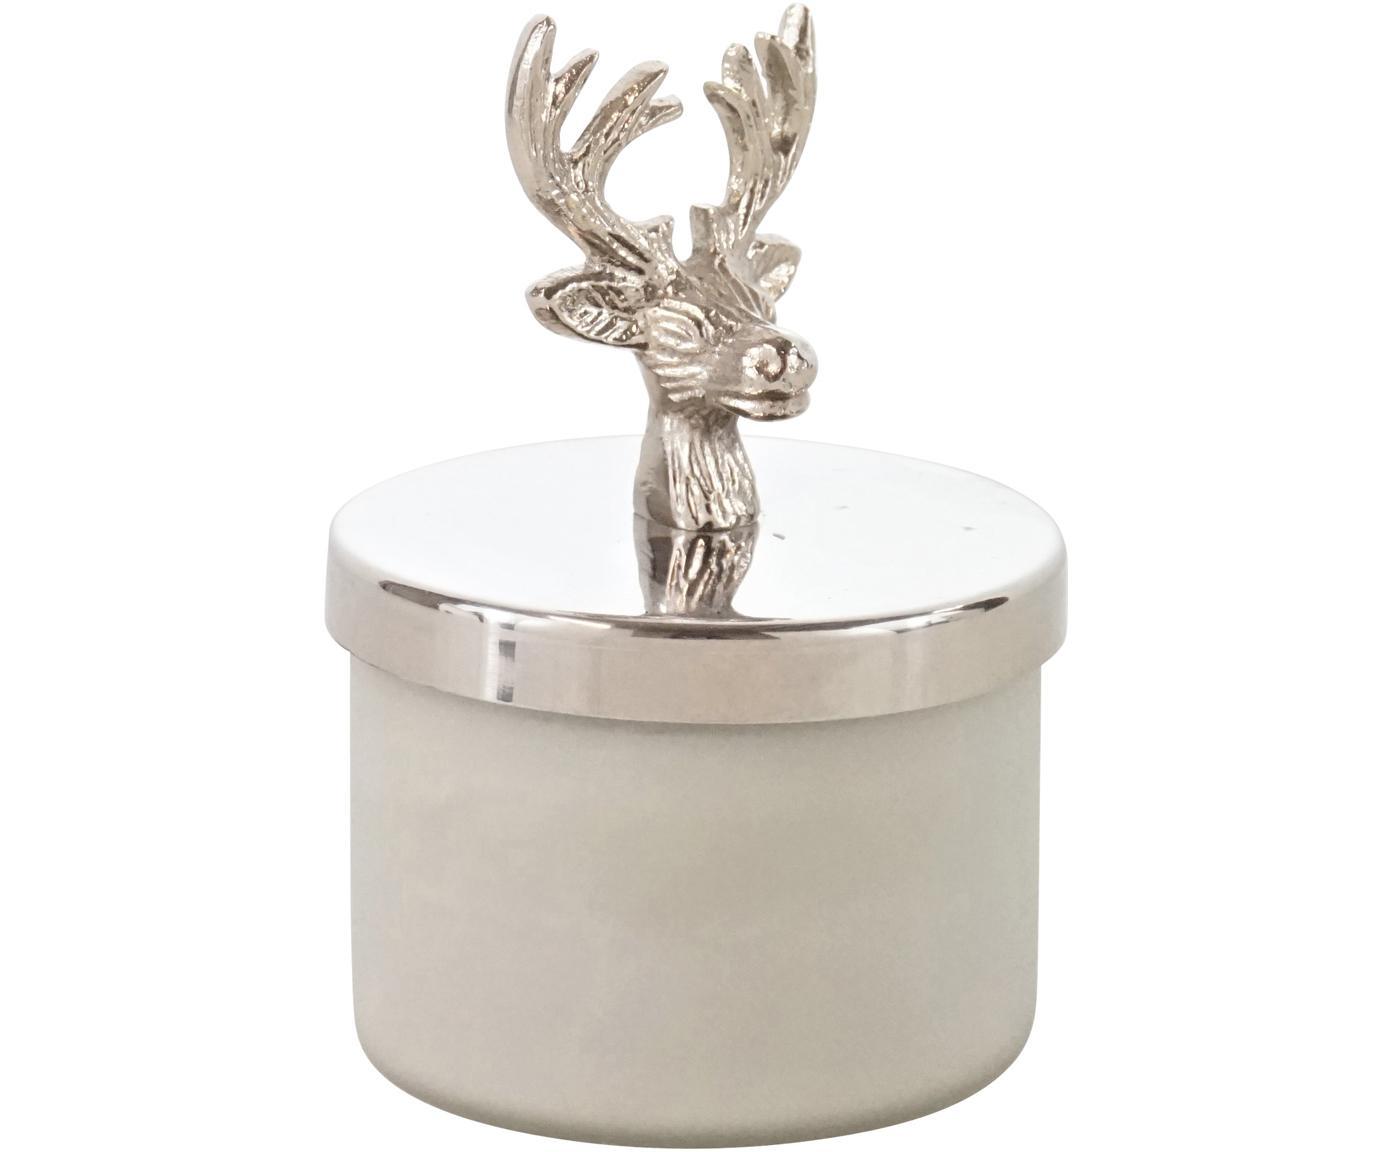 Bote portavelas Deer, Blanco, plateado, Ø 7 x Al 12 cm